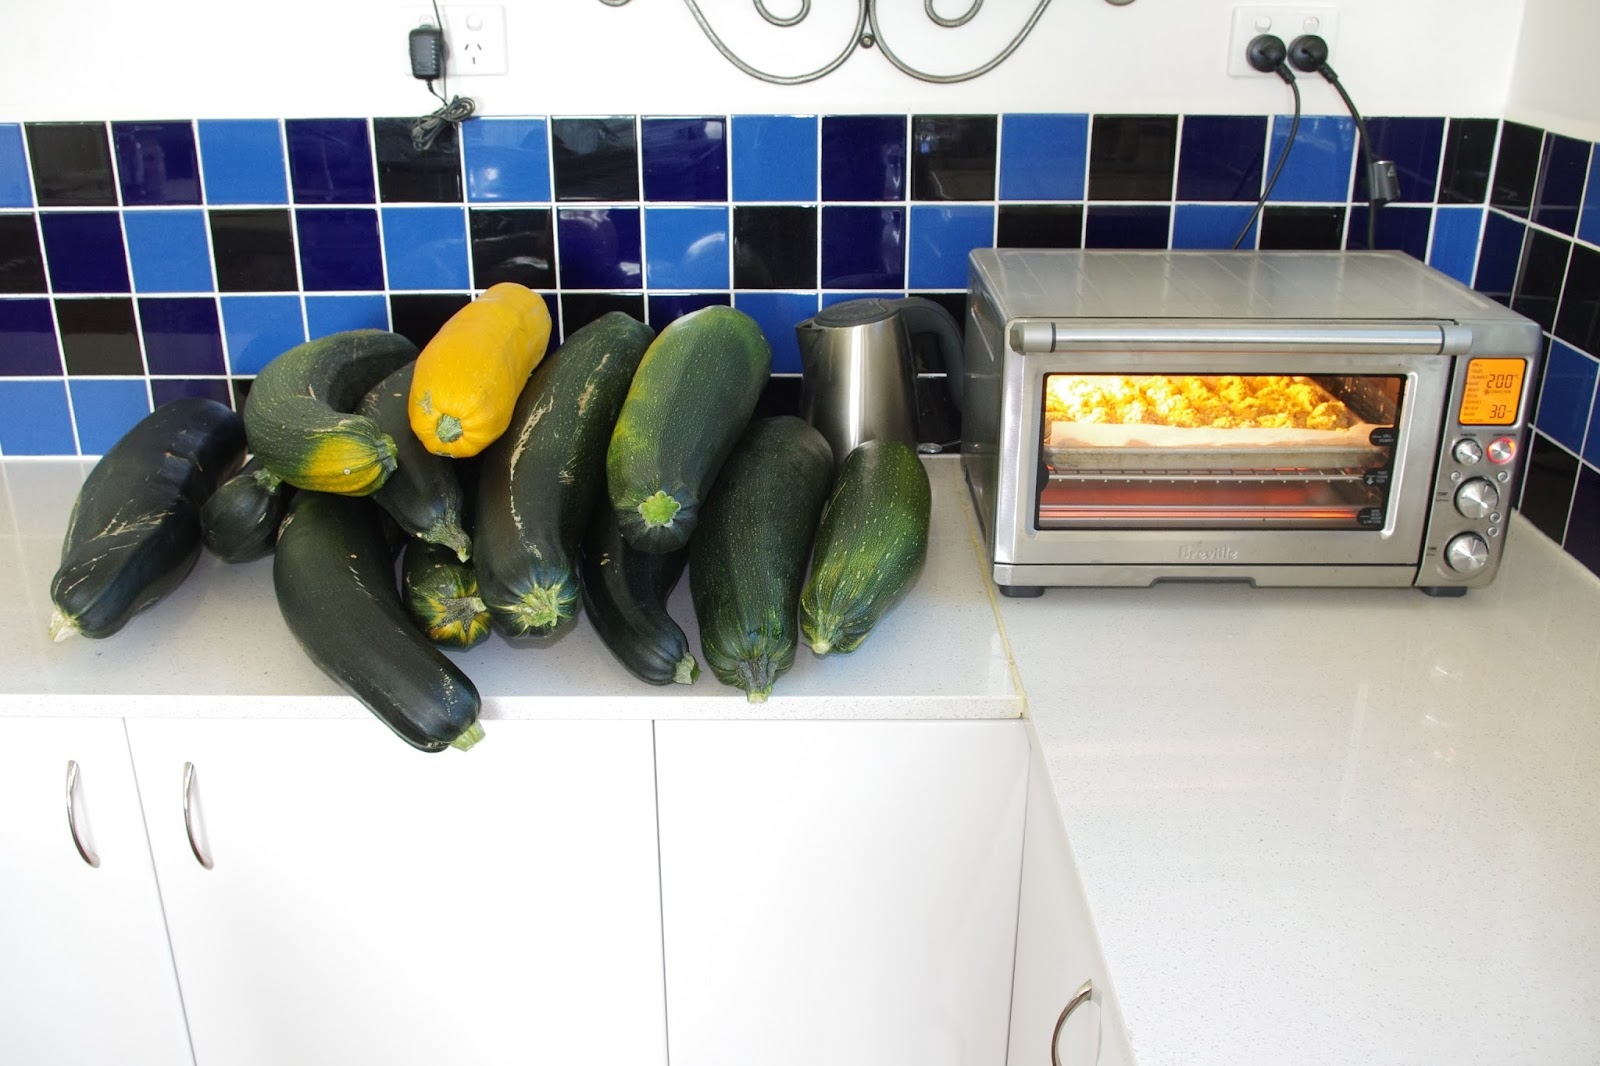 Twelve monster zucchinis